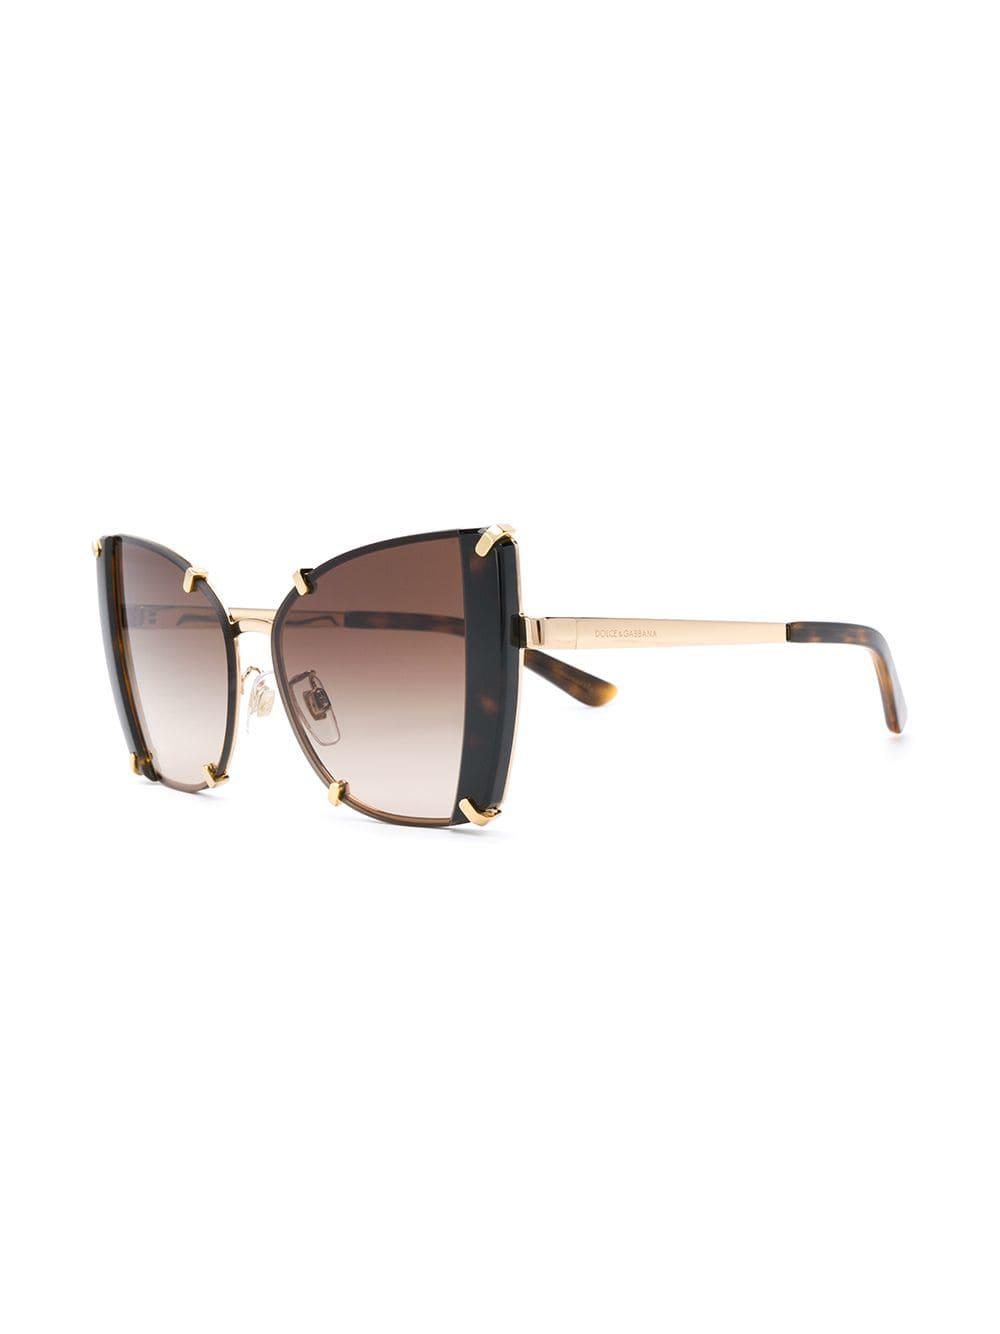 0a31c9da4e3 Lyst - Dolce   Gabbana Oversized Cat Eye Sunglasses in Brown